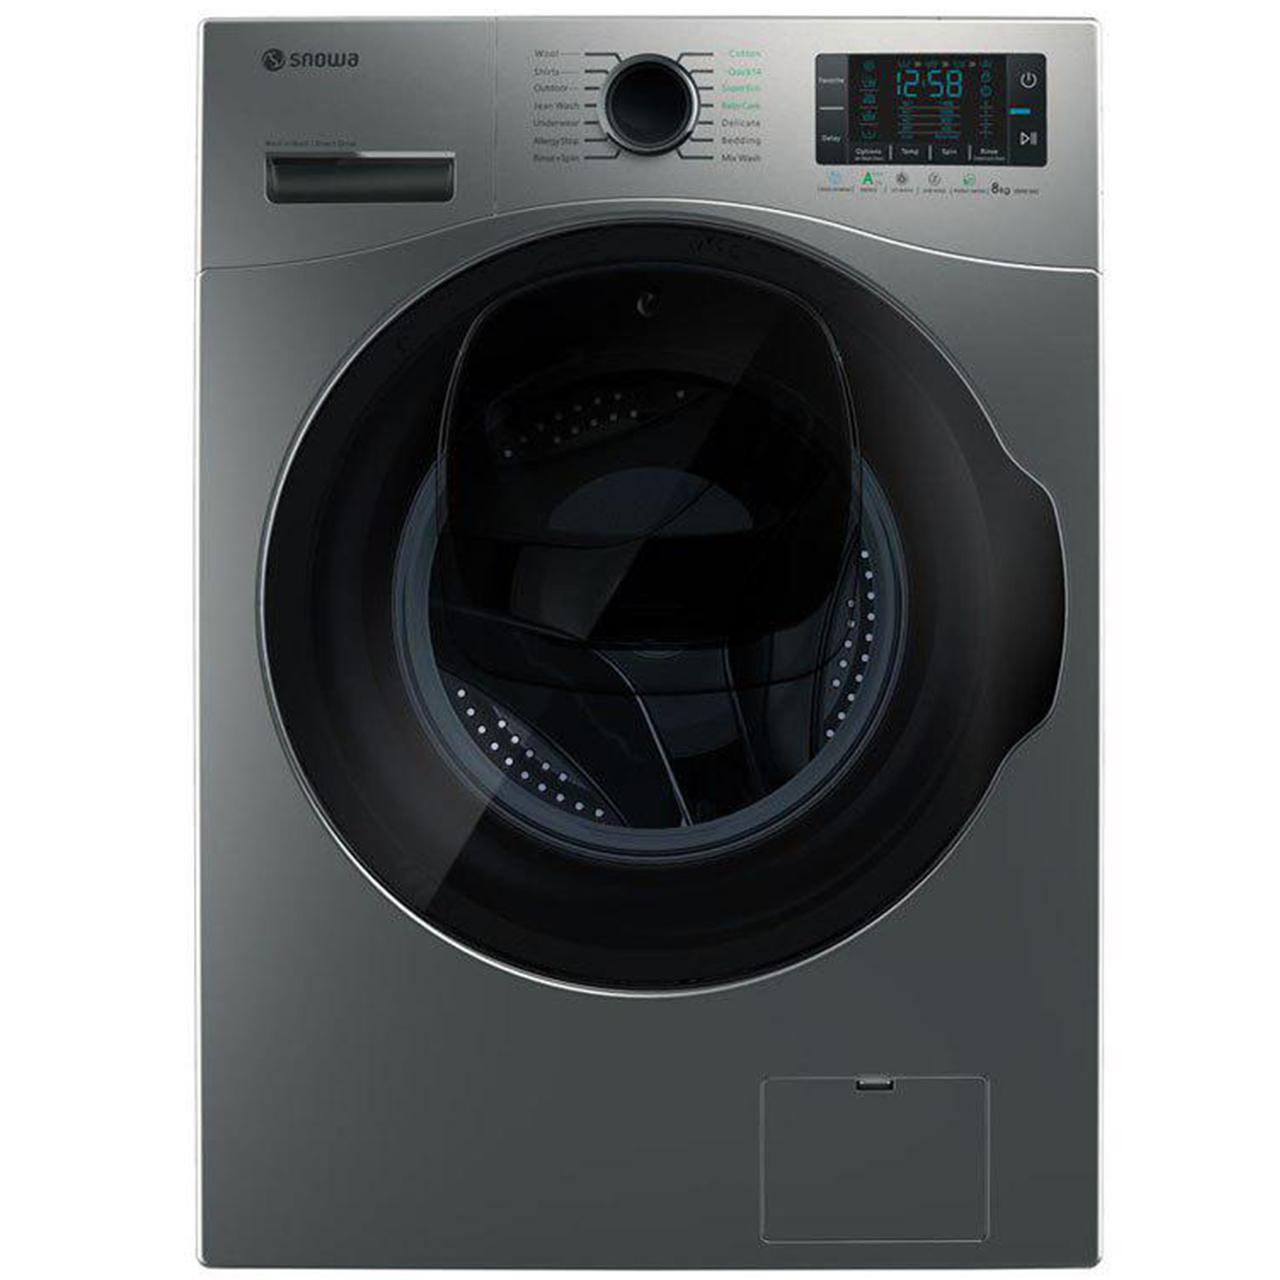 ماشین لباسشویی Wash in Wash اسنوا مدل SWM-842W ظرفیت 8 کیلوگرم